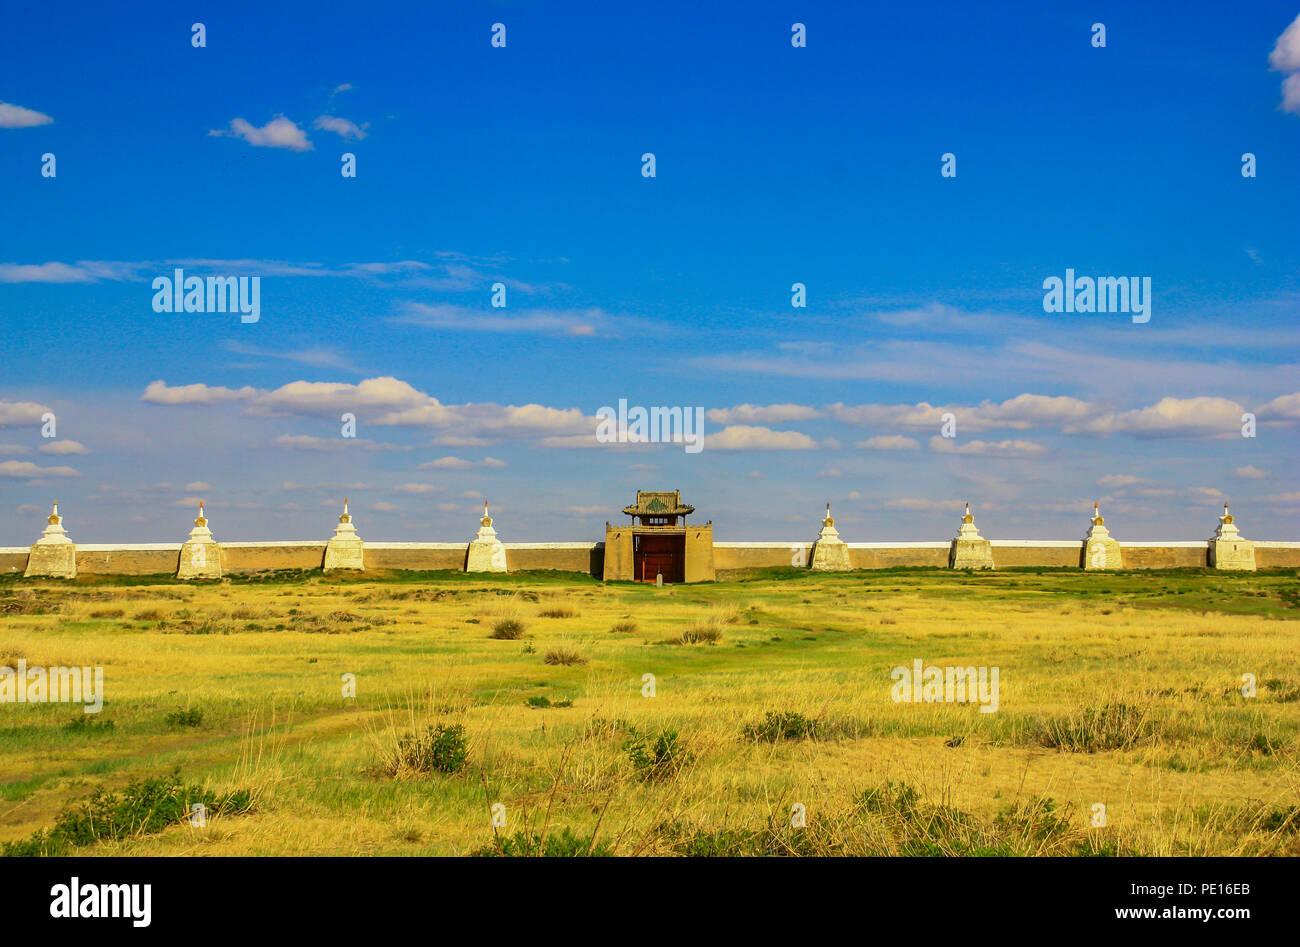 Erdene Zuu Monastery, Mongolia - the earliest surviving Buddhist monastery in Mongolia, the Erdene Zuu Monastery is located close to Karakorum - Stock Image